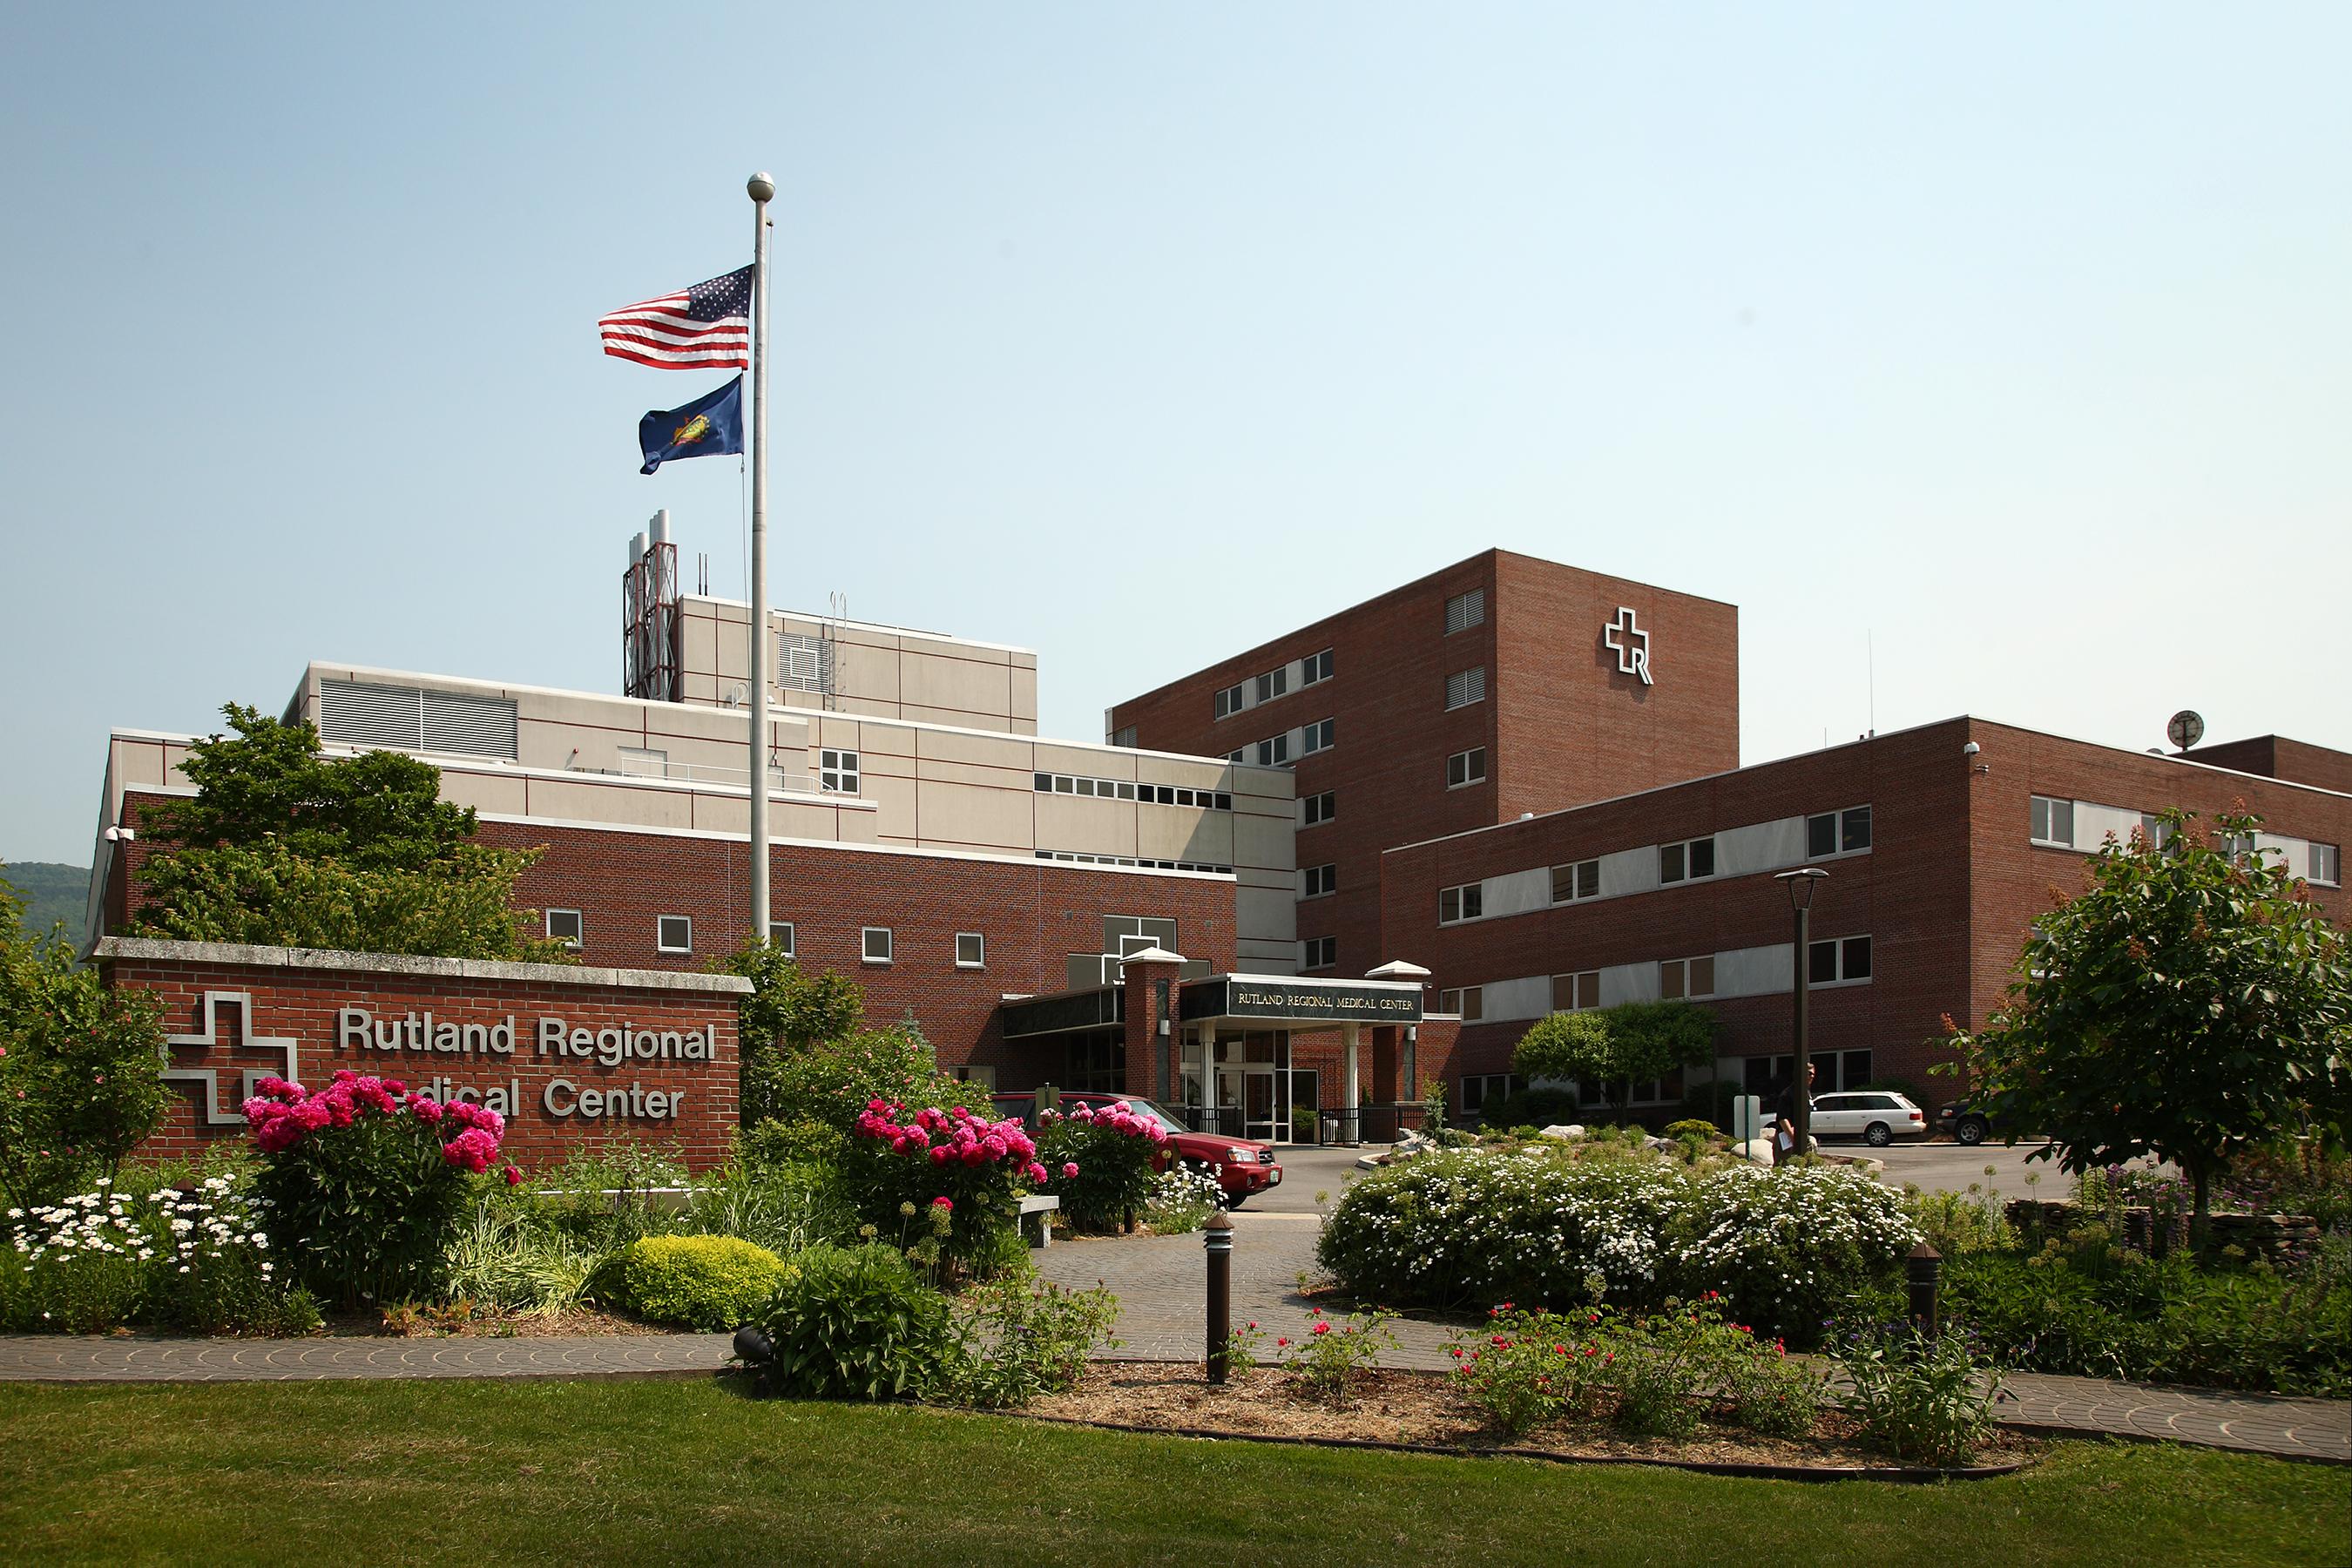 Rutland Regional Medical Center Image